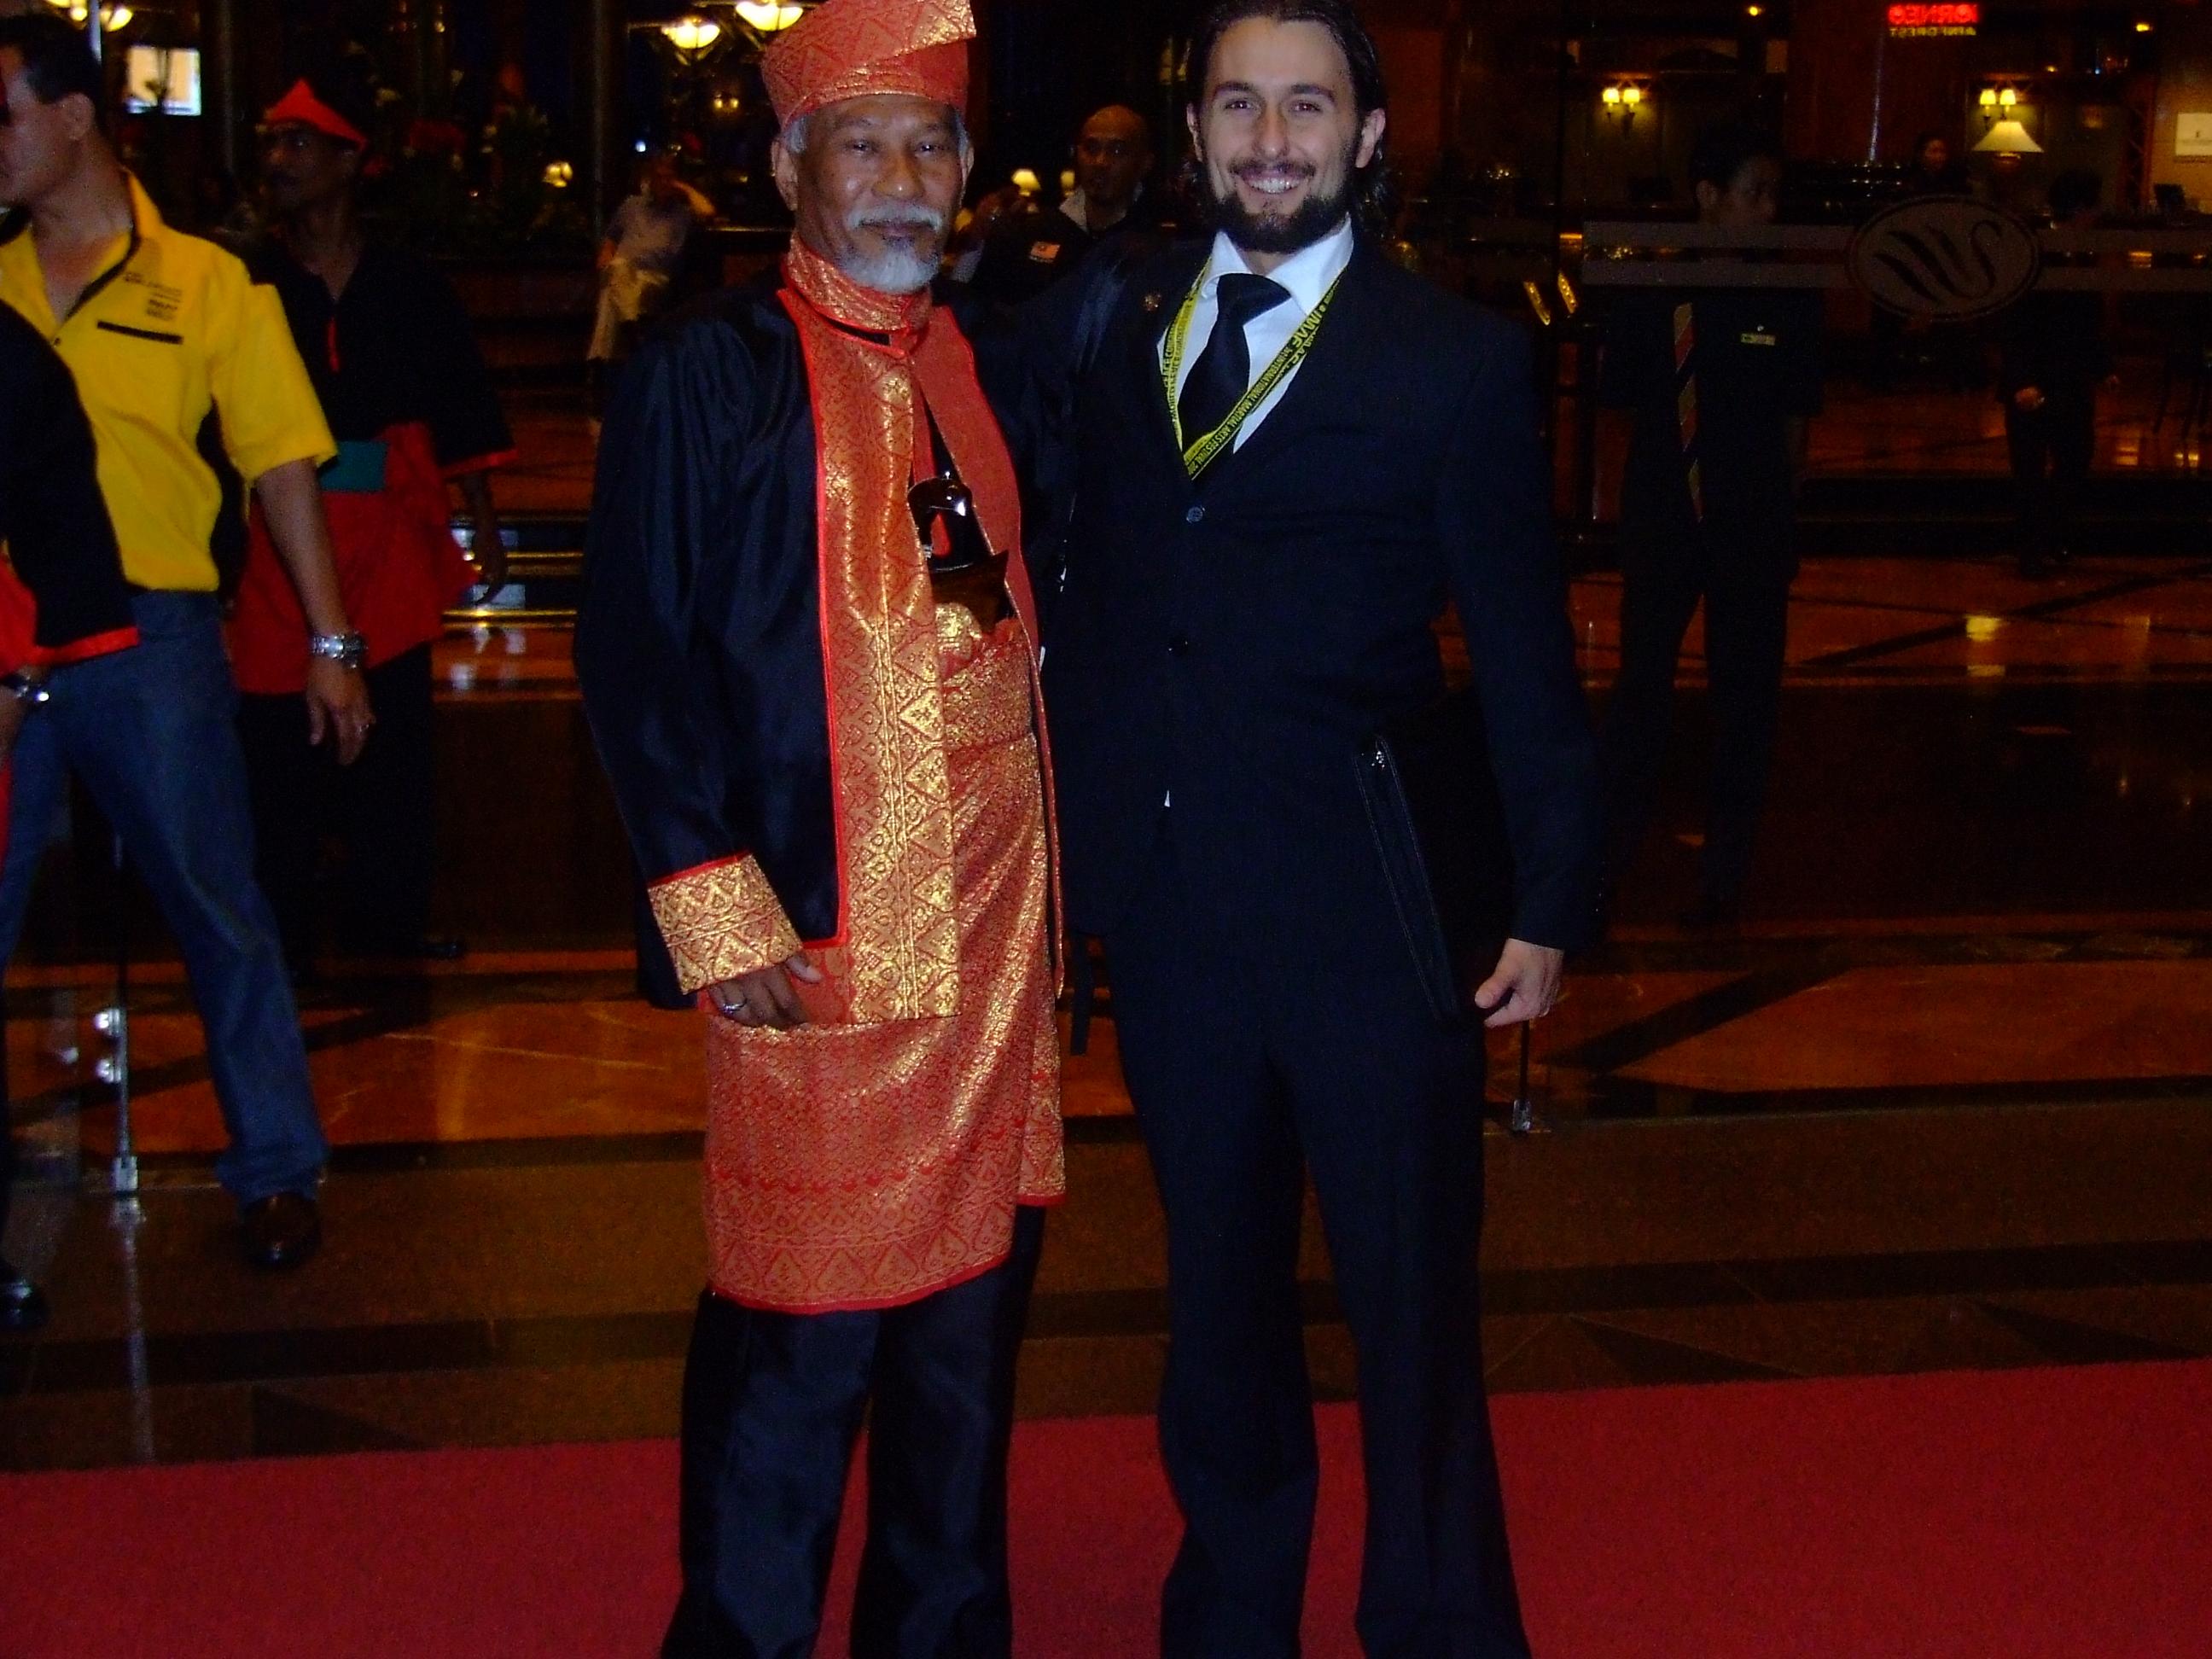 Grand Master Zahalan & EL